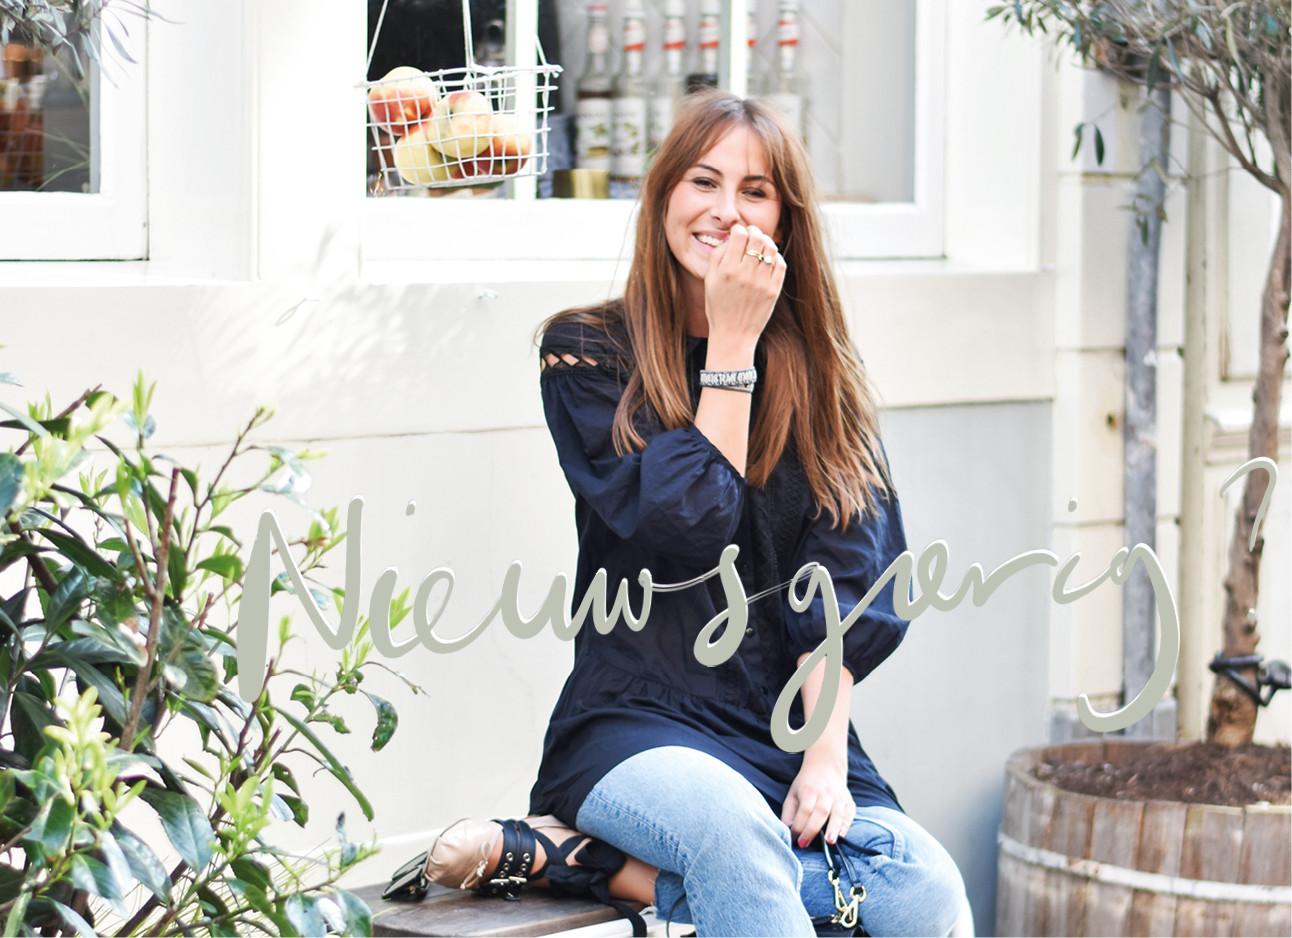 lilian lachend buiten voor PLUK amsterdam